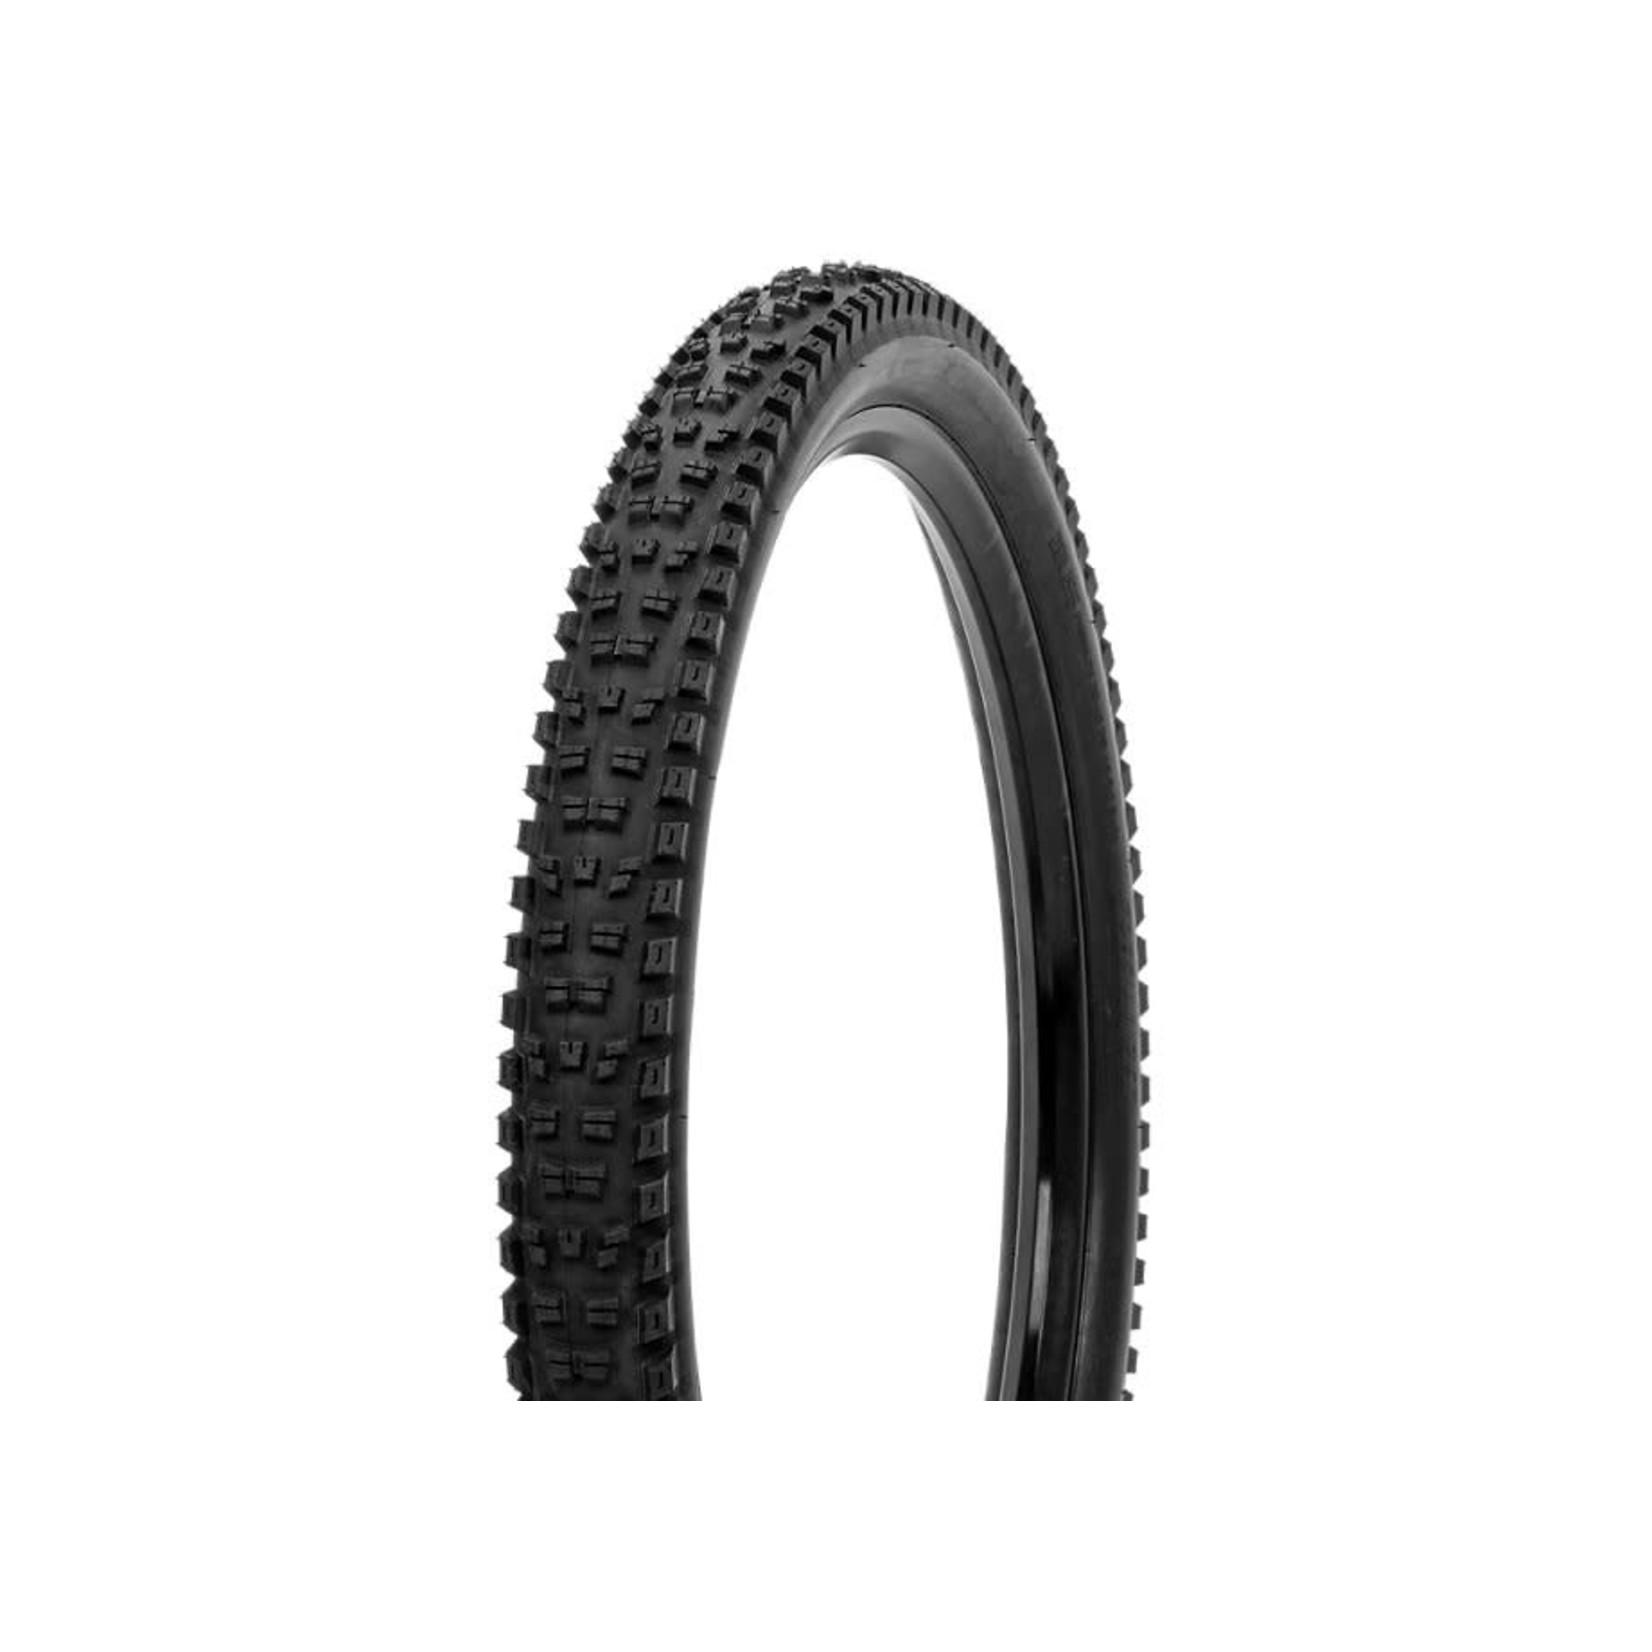 Specialized Specialized Eliminator Tubeless Ready Folding Bead Tire 29 x 2.3